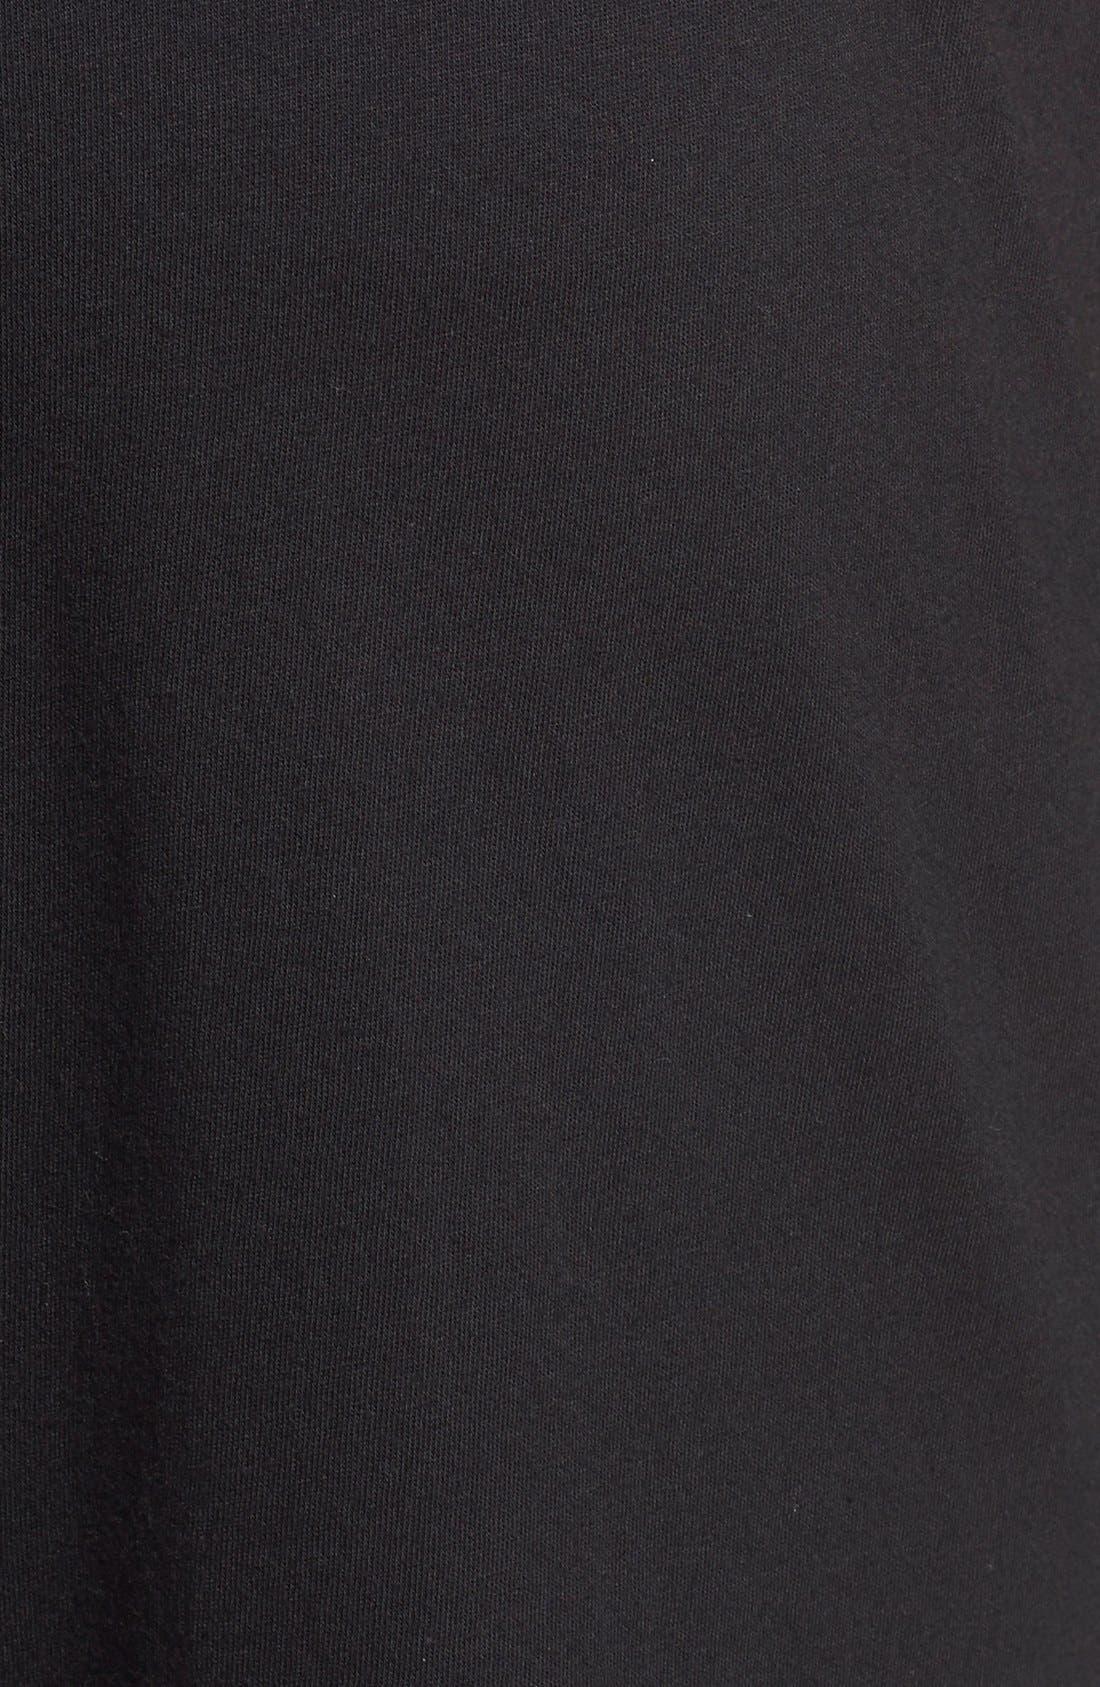 POLO RALPH LAUREN, Relaxed Fit Cotton Knit Lounge Jogger Pants, Alternate thumbnail 3, color, BLACK